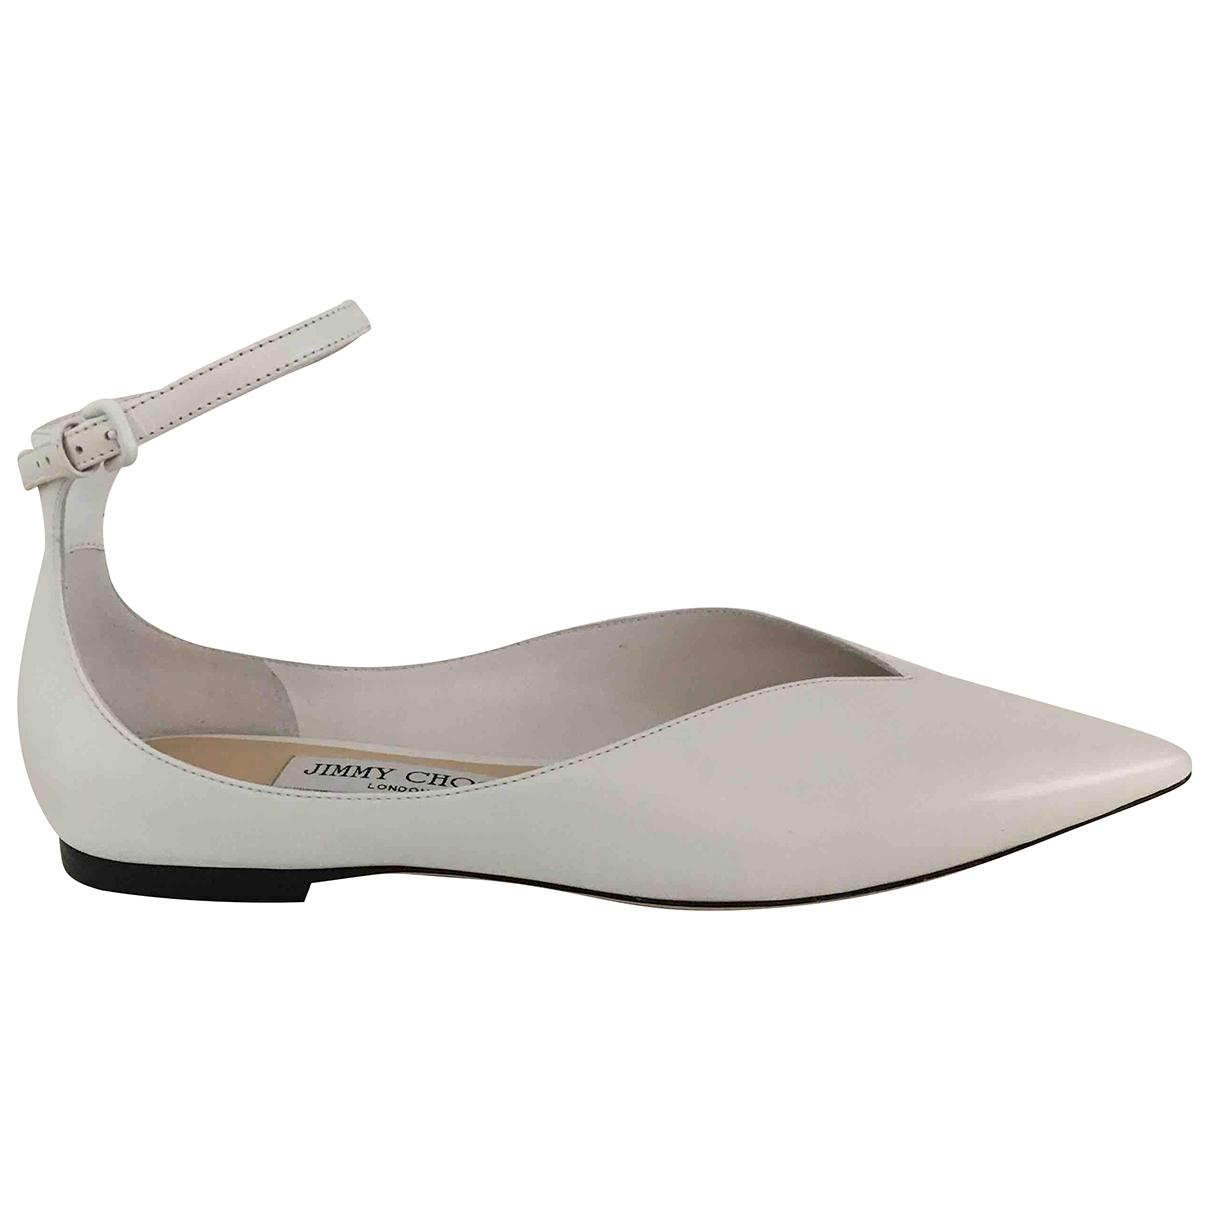 Jimmy Choo \N White Leather Ballet flats for Women 38 EU